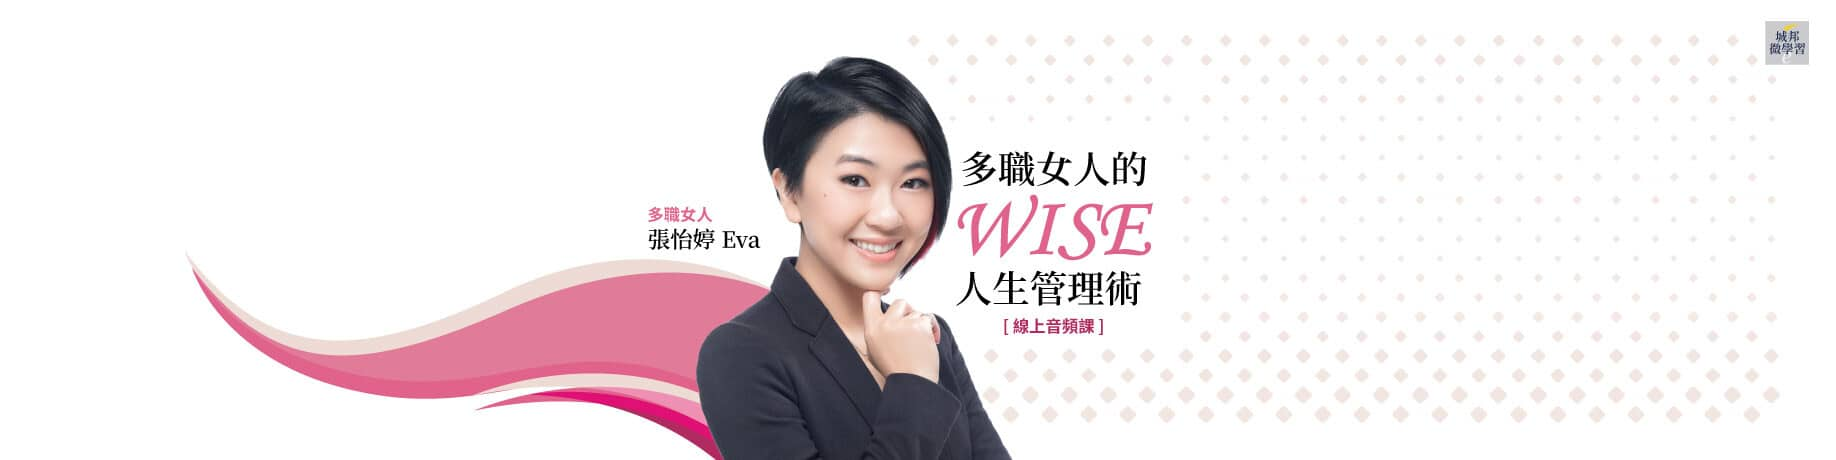 EVA張怡婷:多職女人的WISE人生管理術